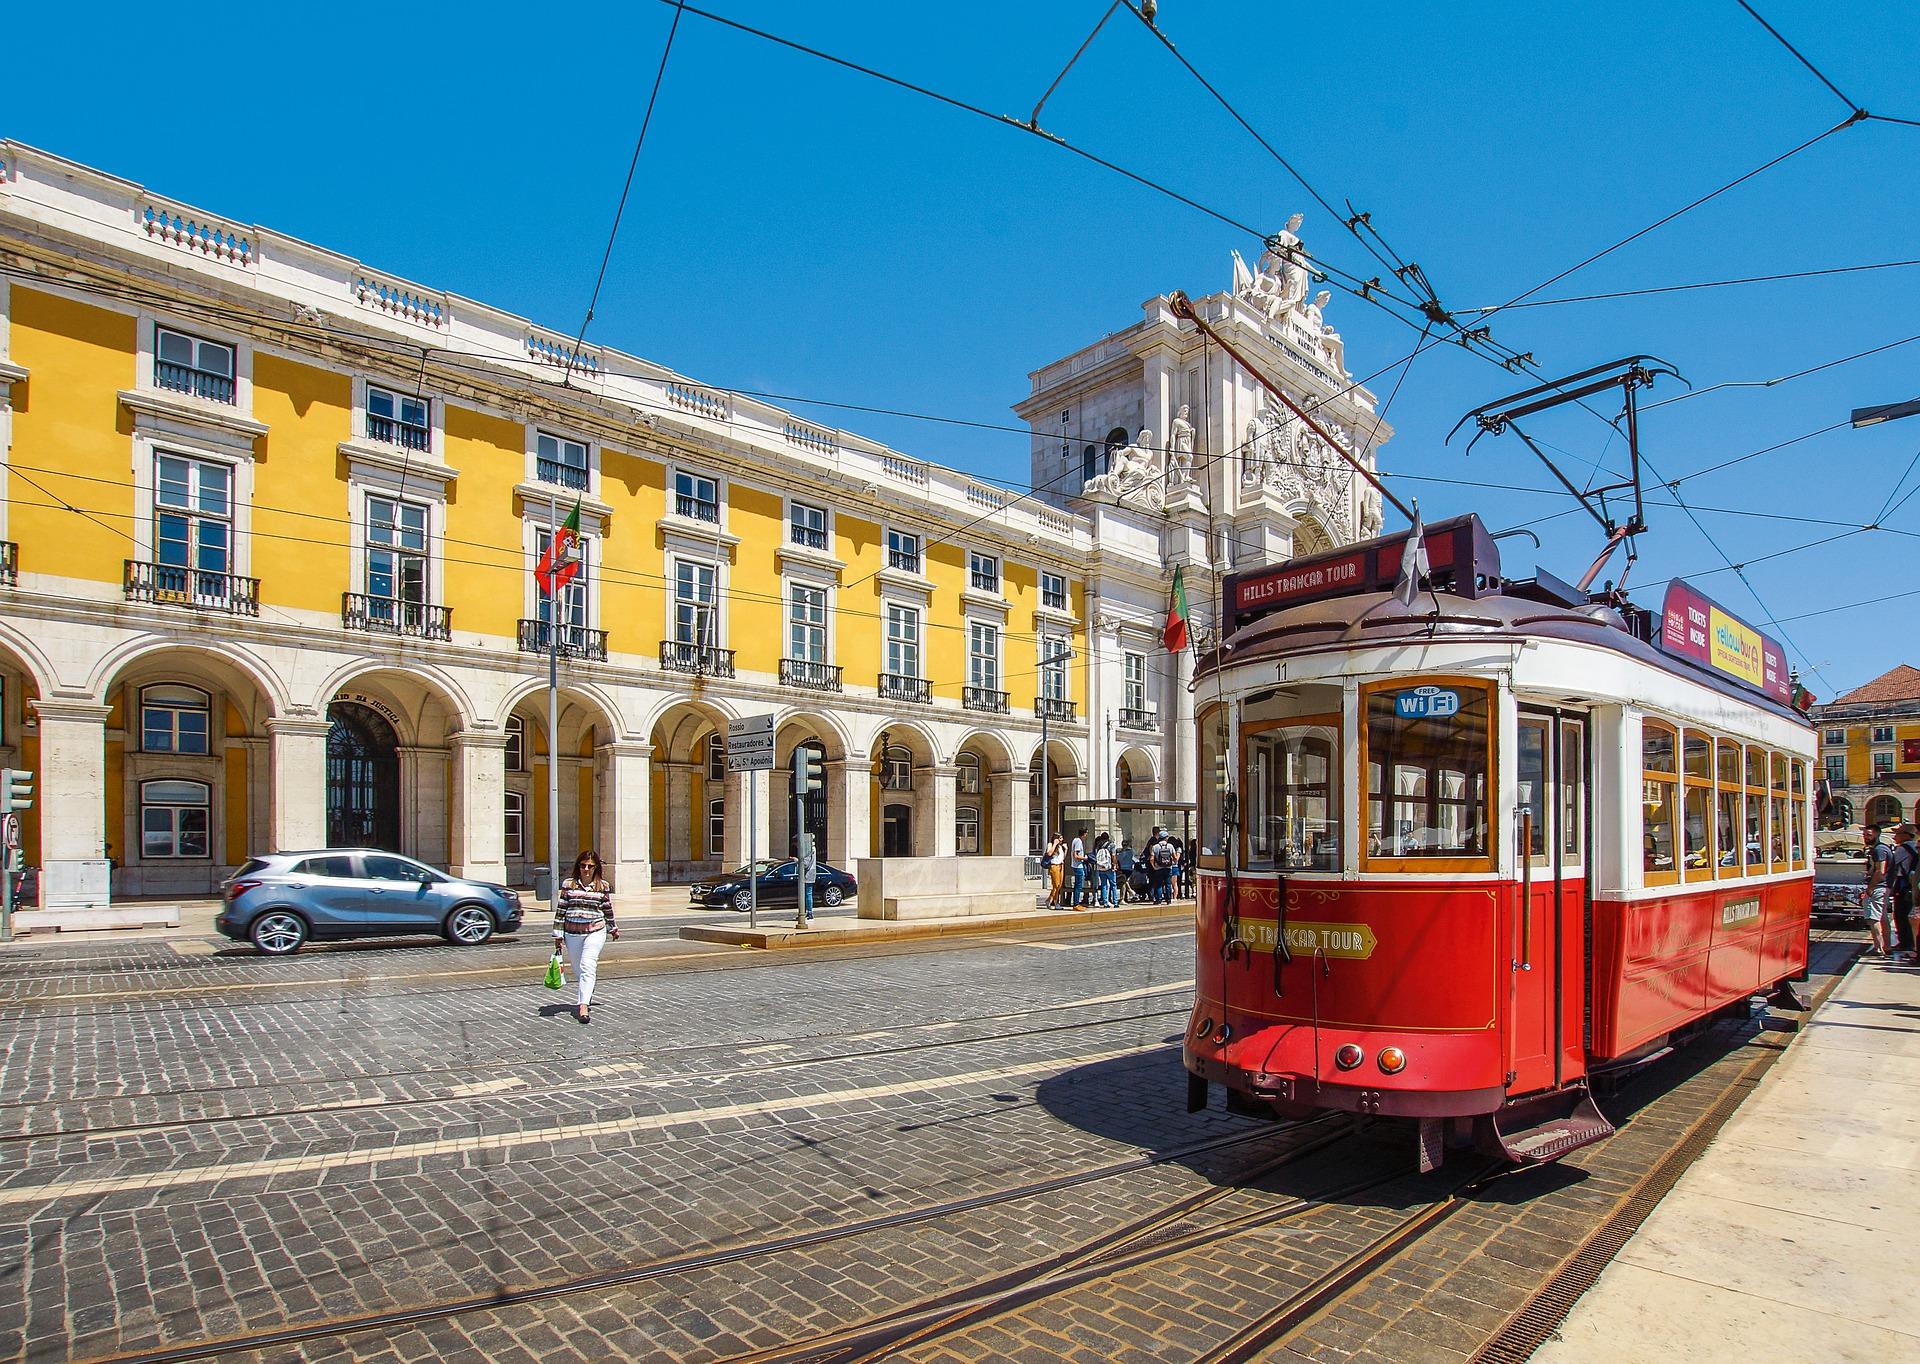 tram-4379656_1920